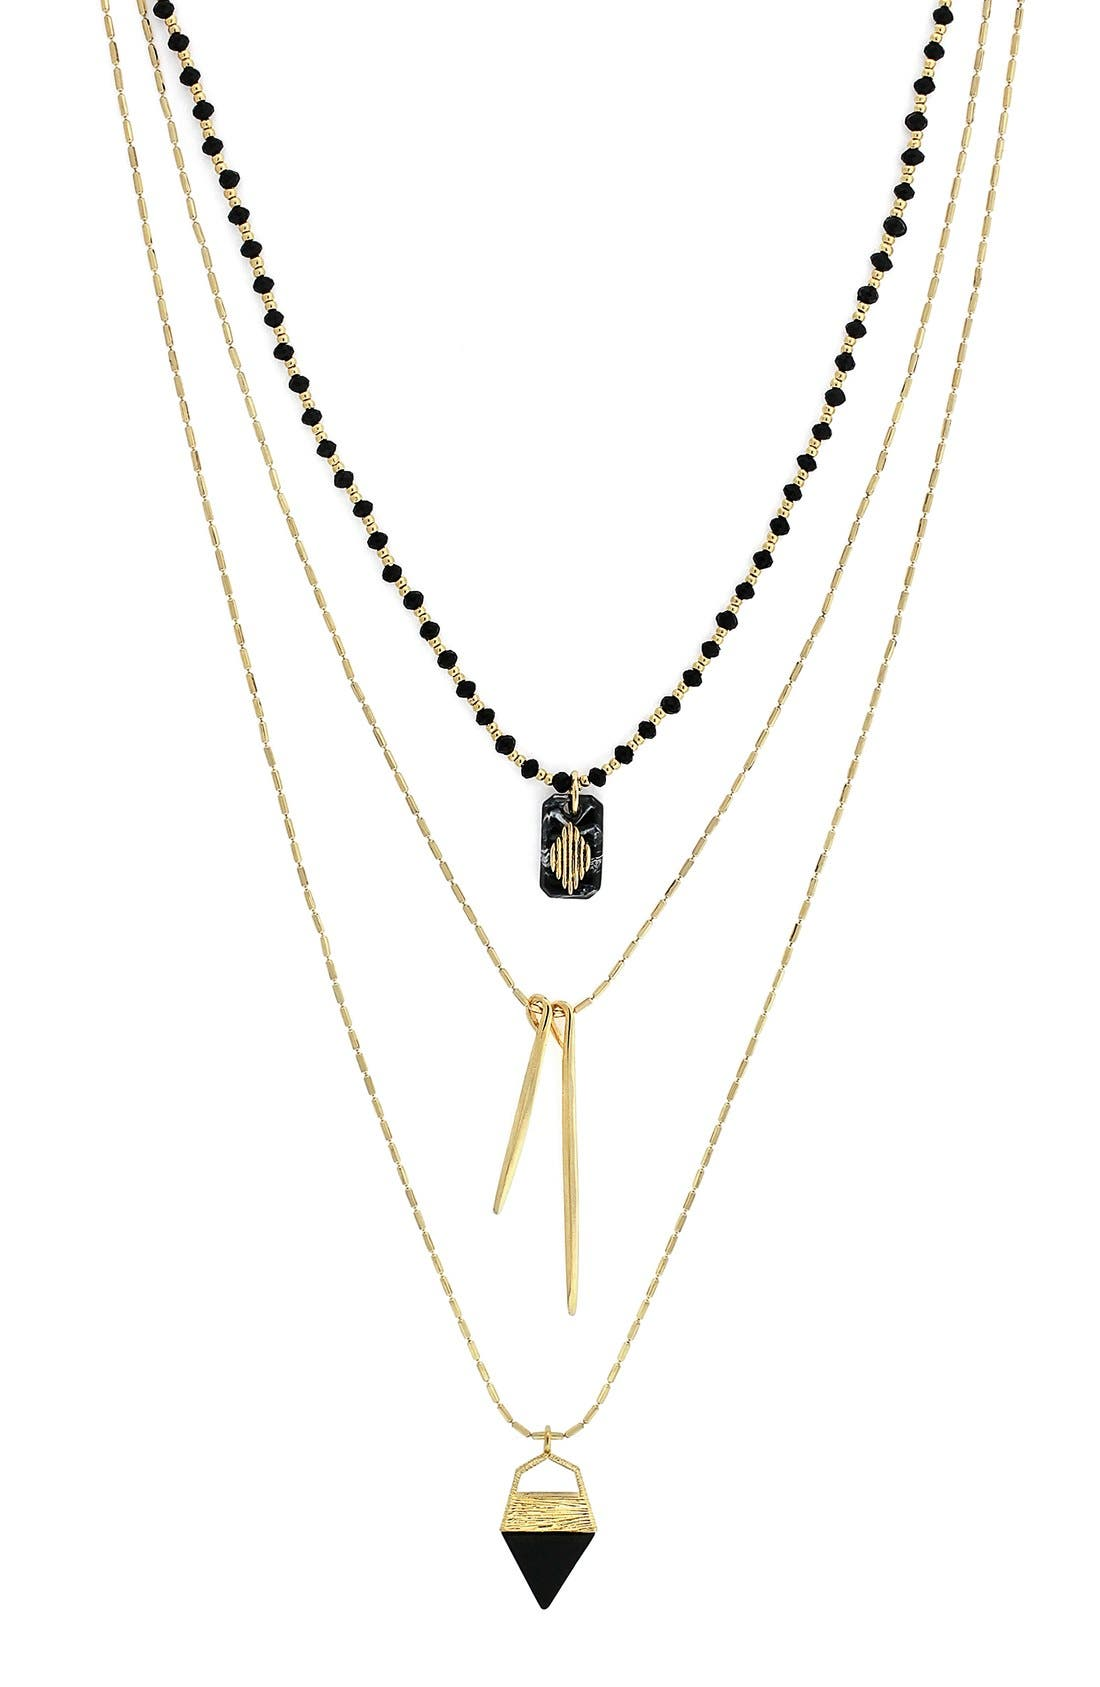 Main Image - Vince Camuto 'Serengeti Breeze' Triple Strand Necklace